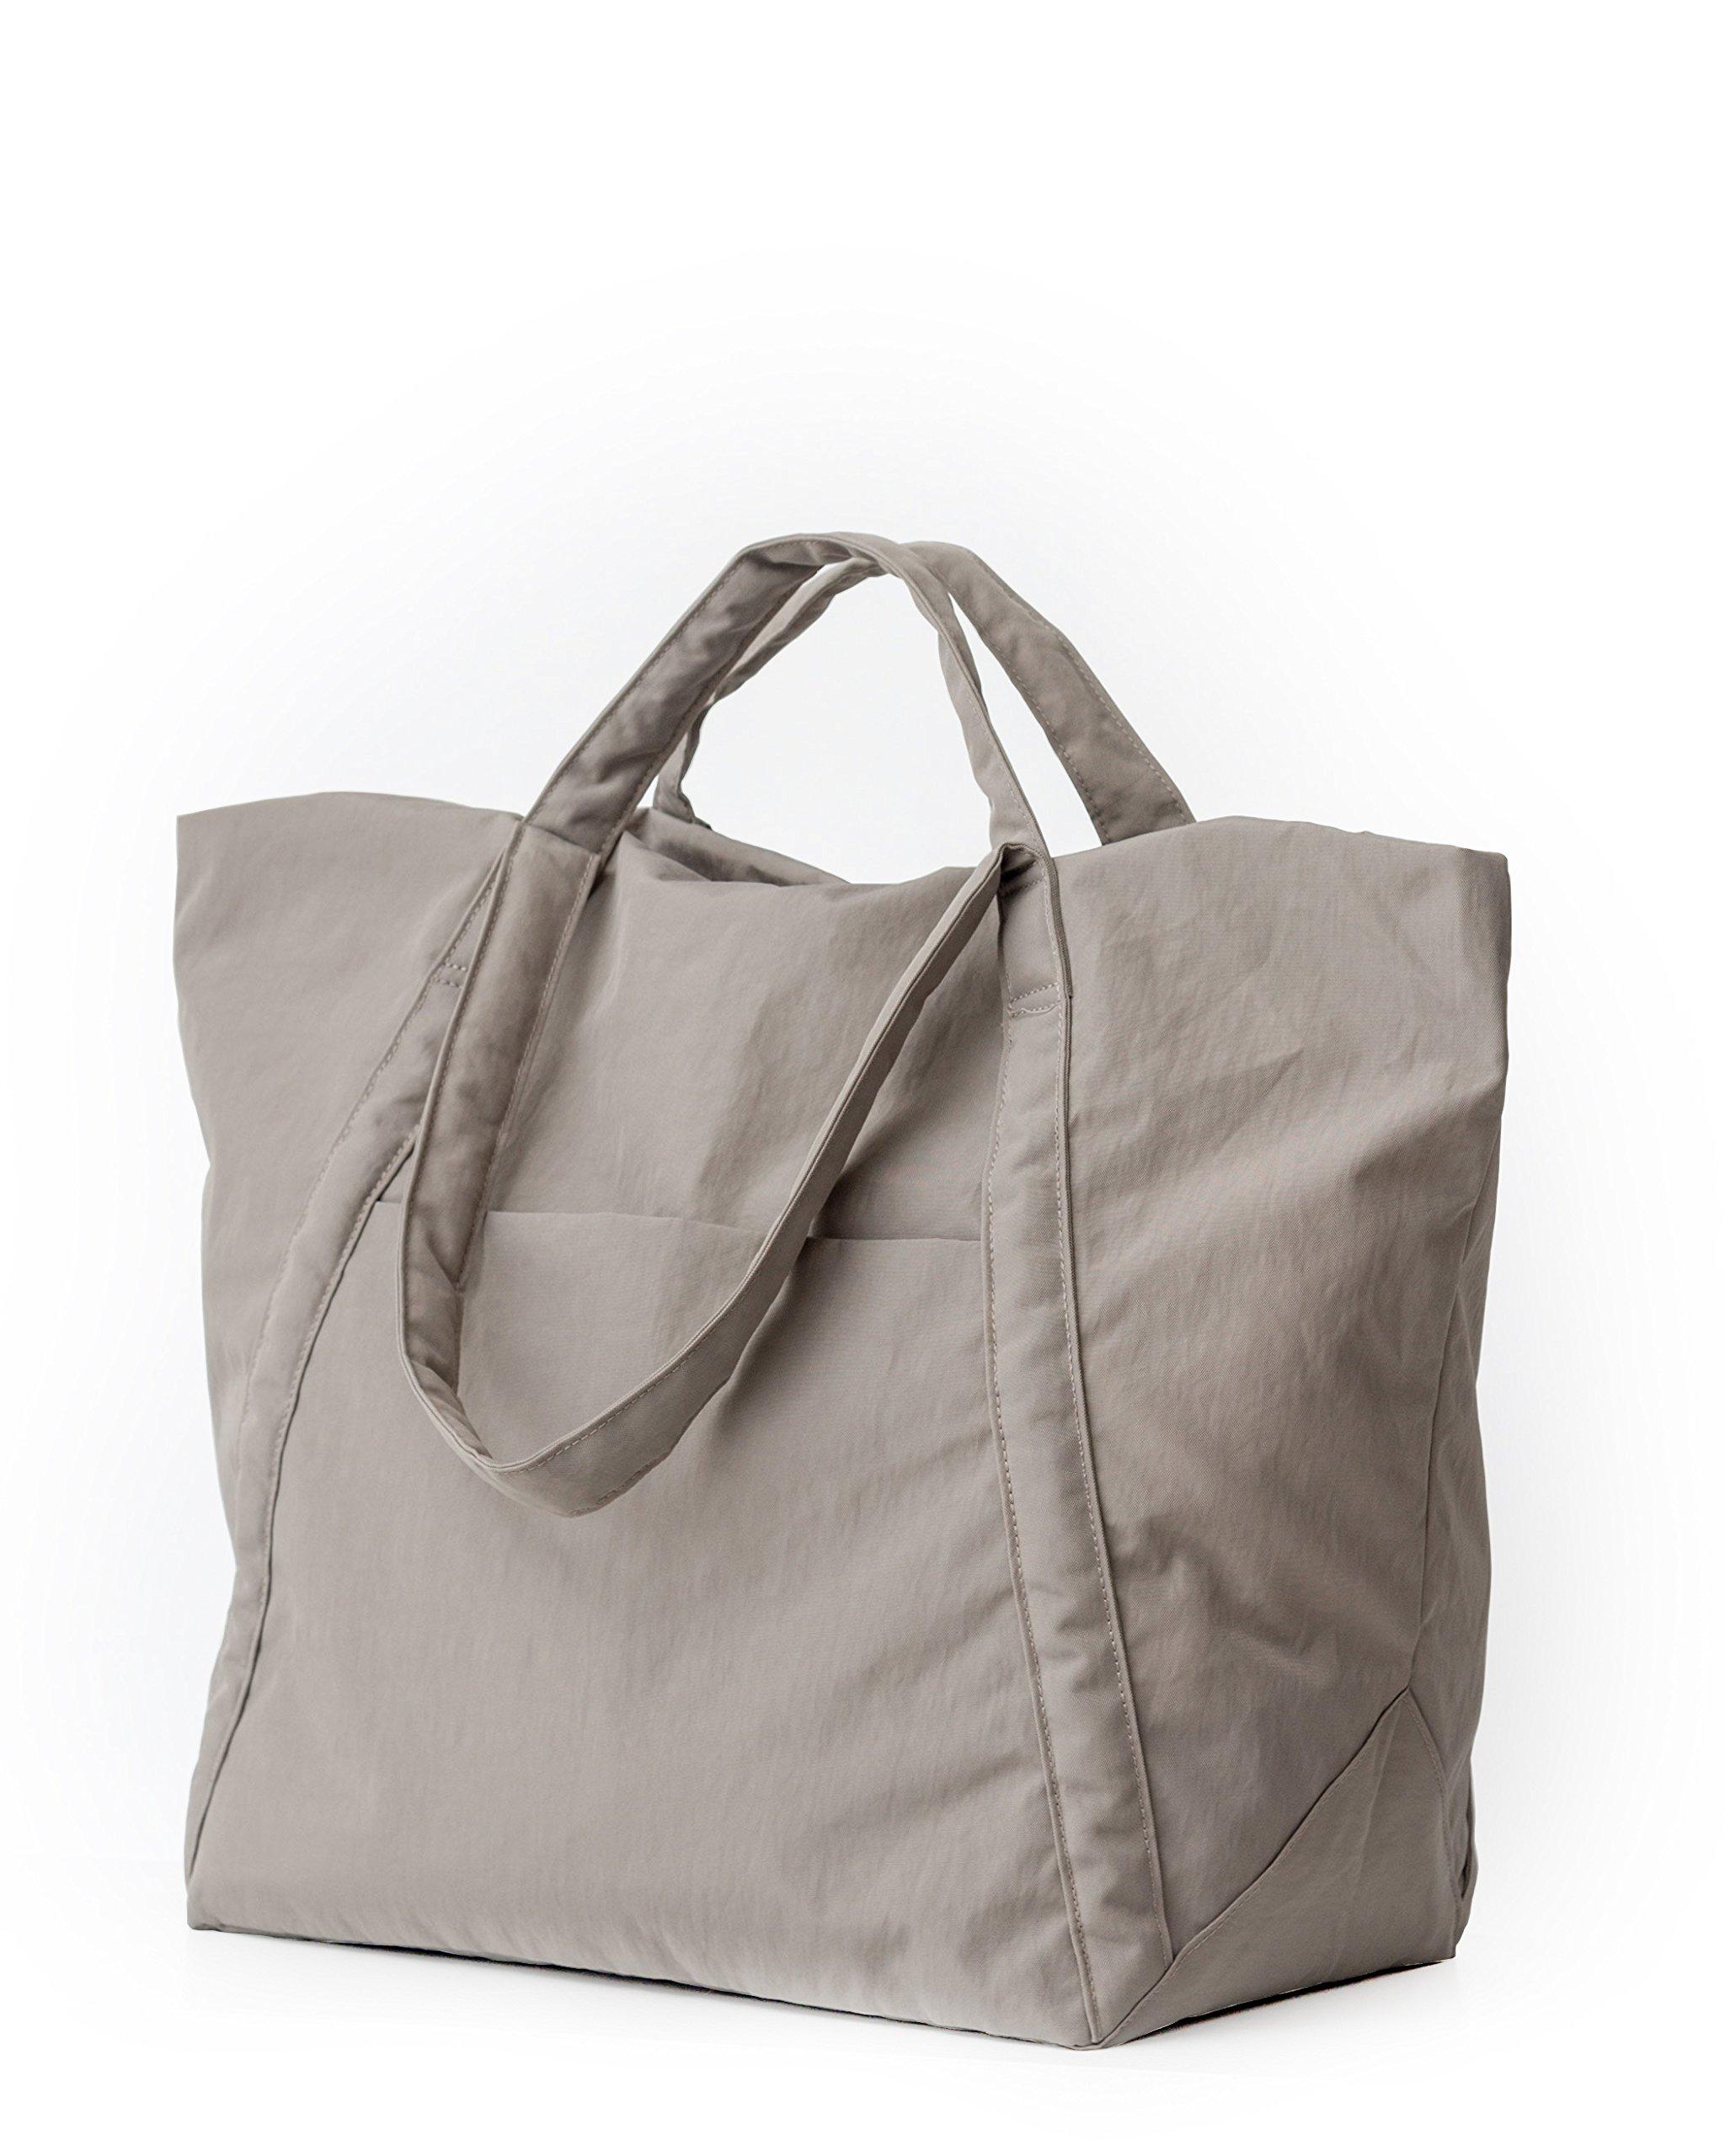 BAGGU Travel Cloud Bag, Lightweight Nylon Packable Tote for Travel or Everyday Use, Mushroom